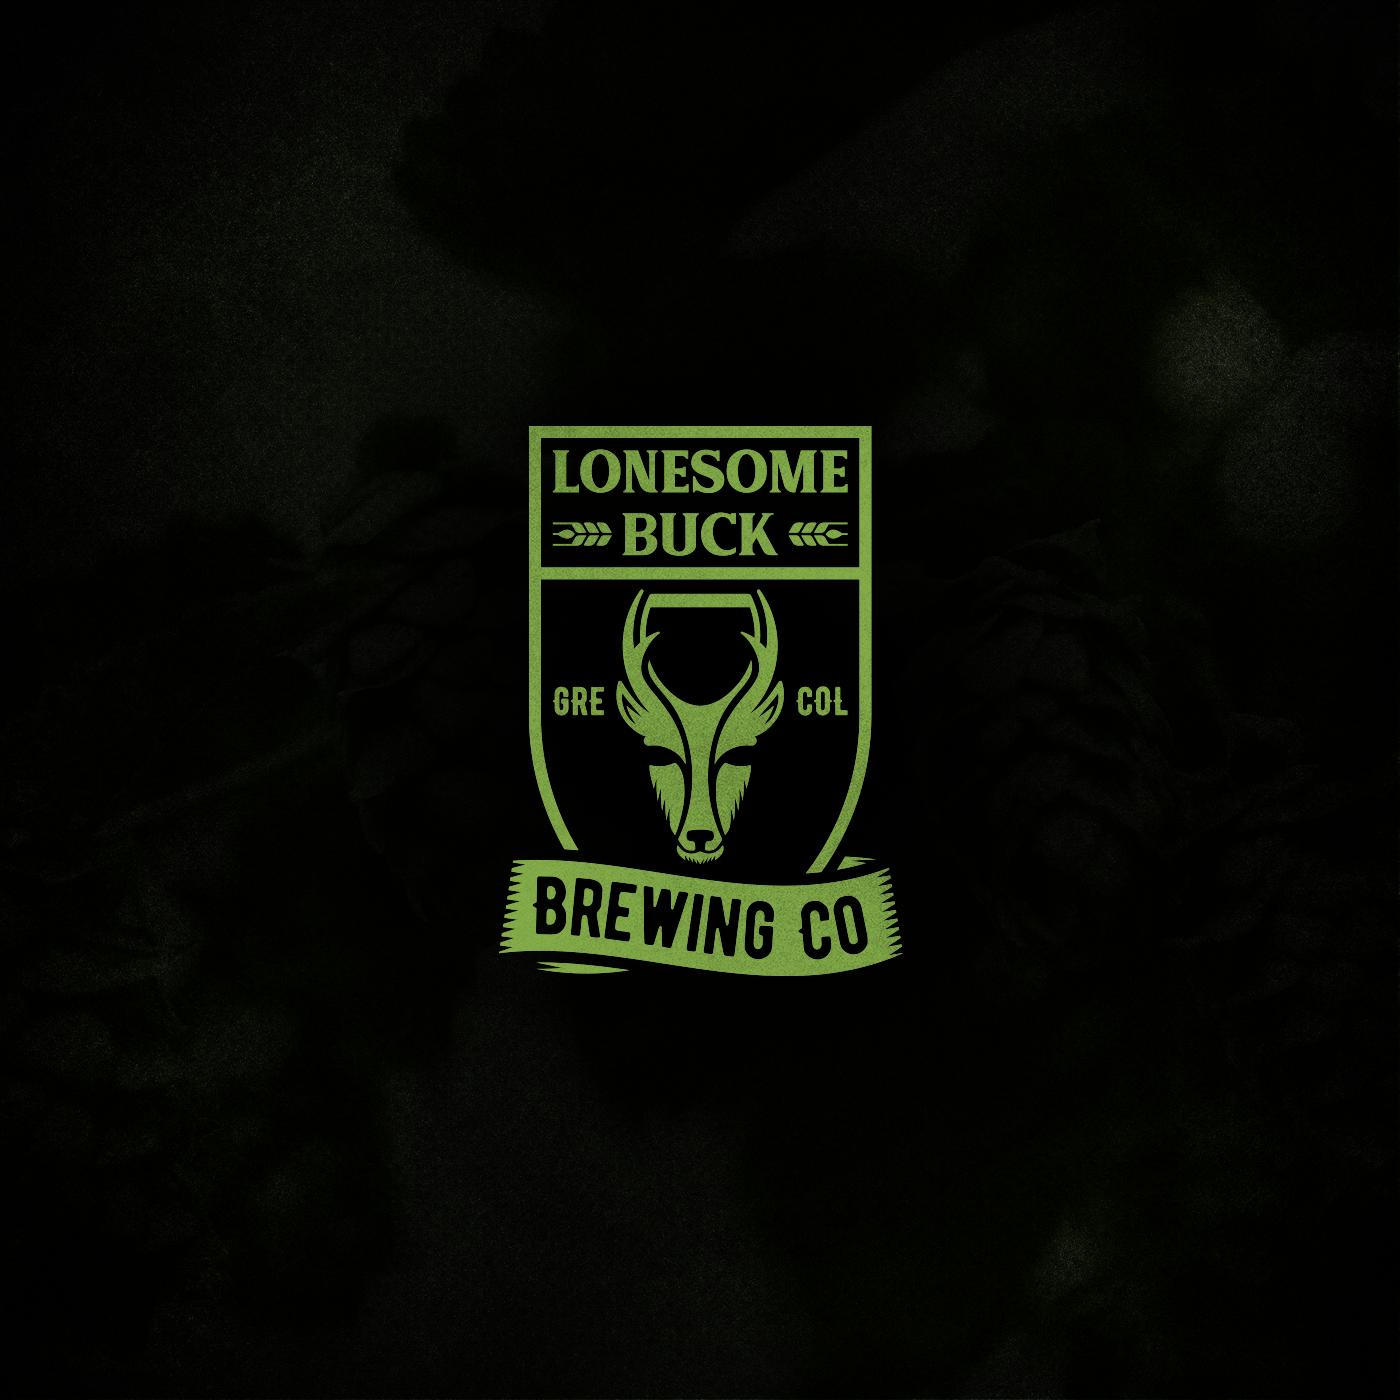 Logo/Branding Update